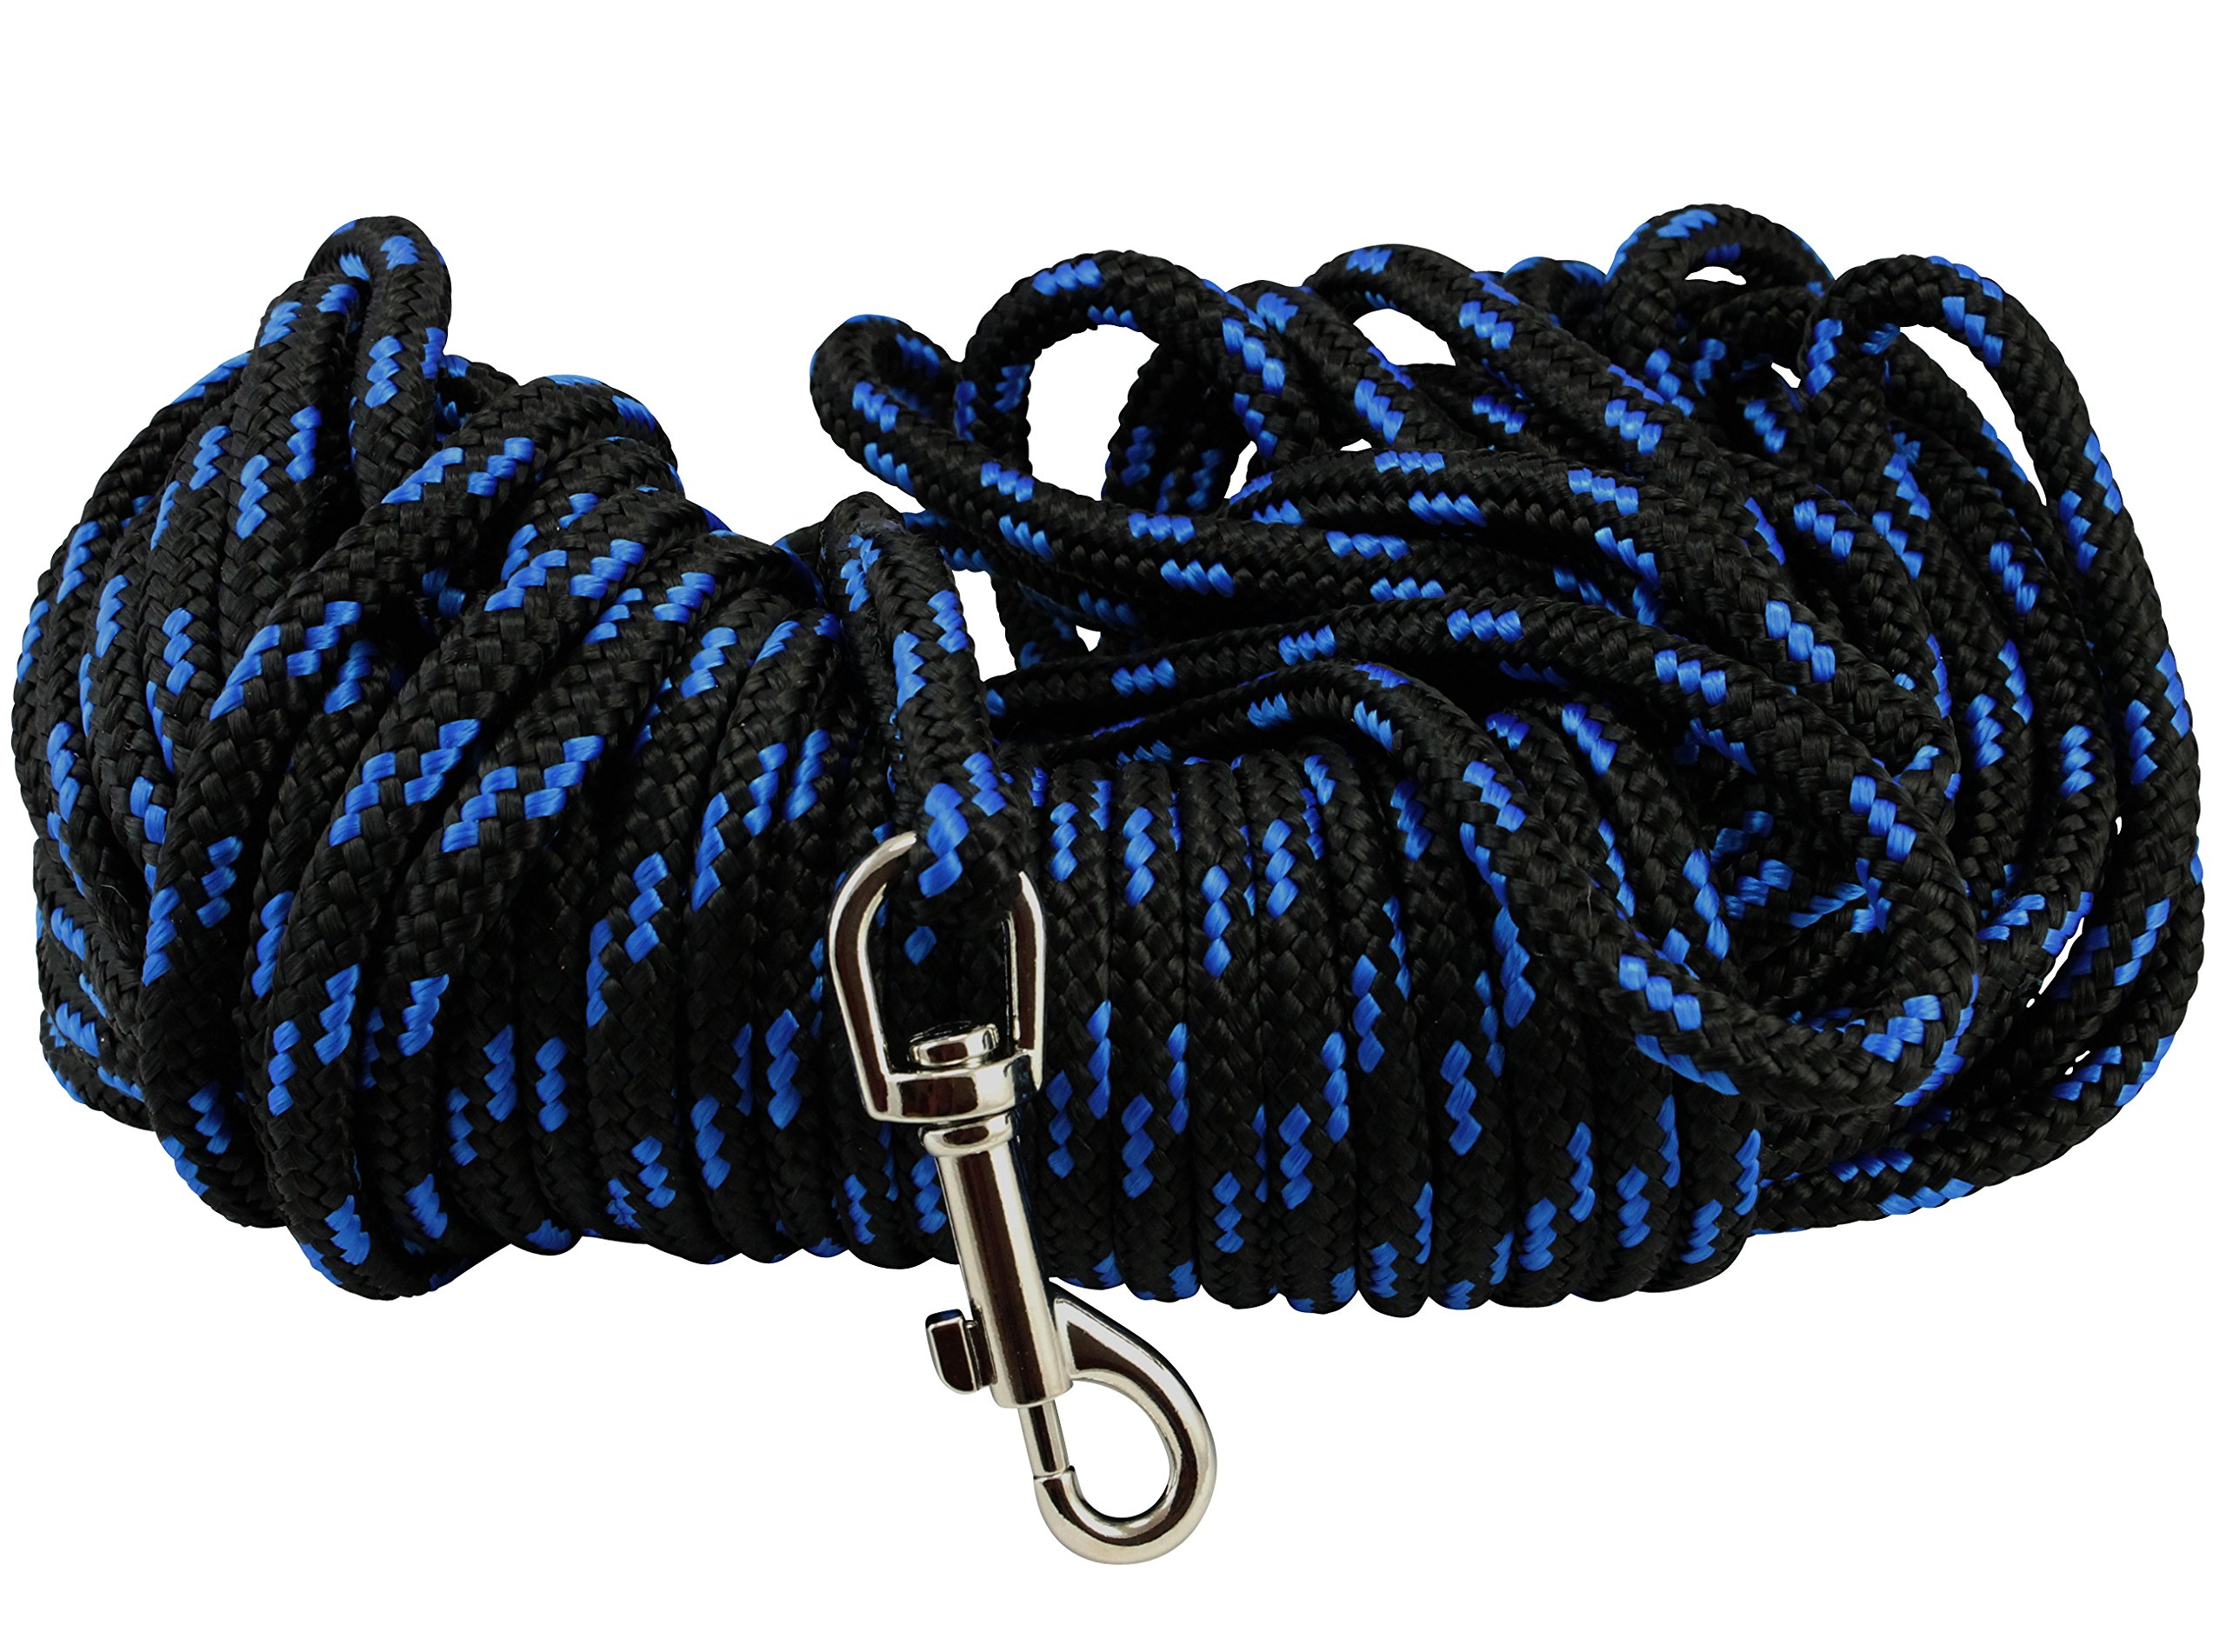 Dogs My Love Braided Nylon Rope Tracking Dog Leash, Black/Blue 15-Feet/30-Feet/45-Feet/60-Feet 3/8'' Diameter Training Lead Medium (60ft - Diam 3/8'' (8mm)) by Dogs My Love (Image #3)